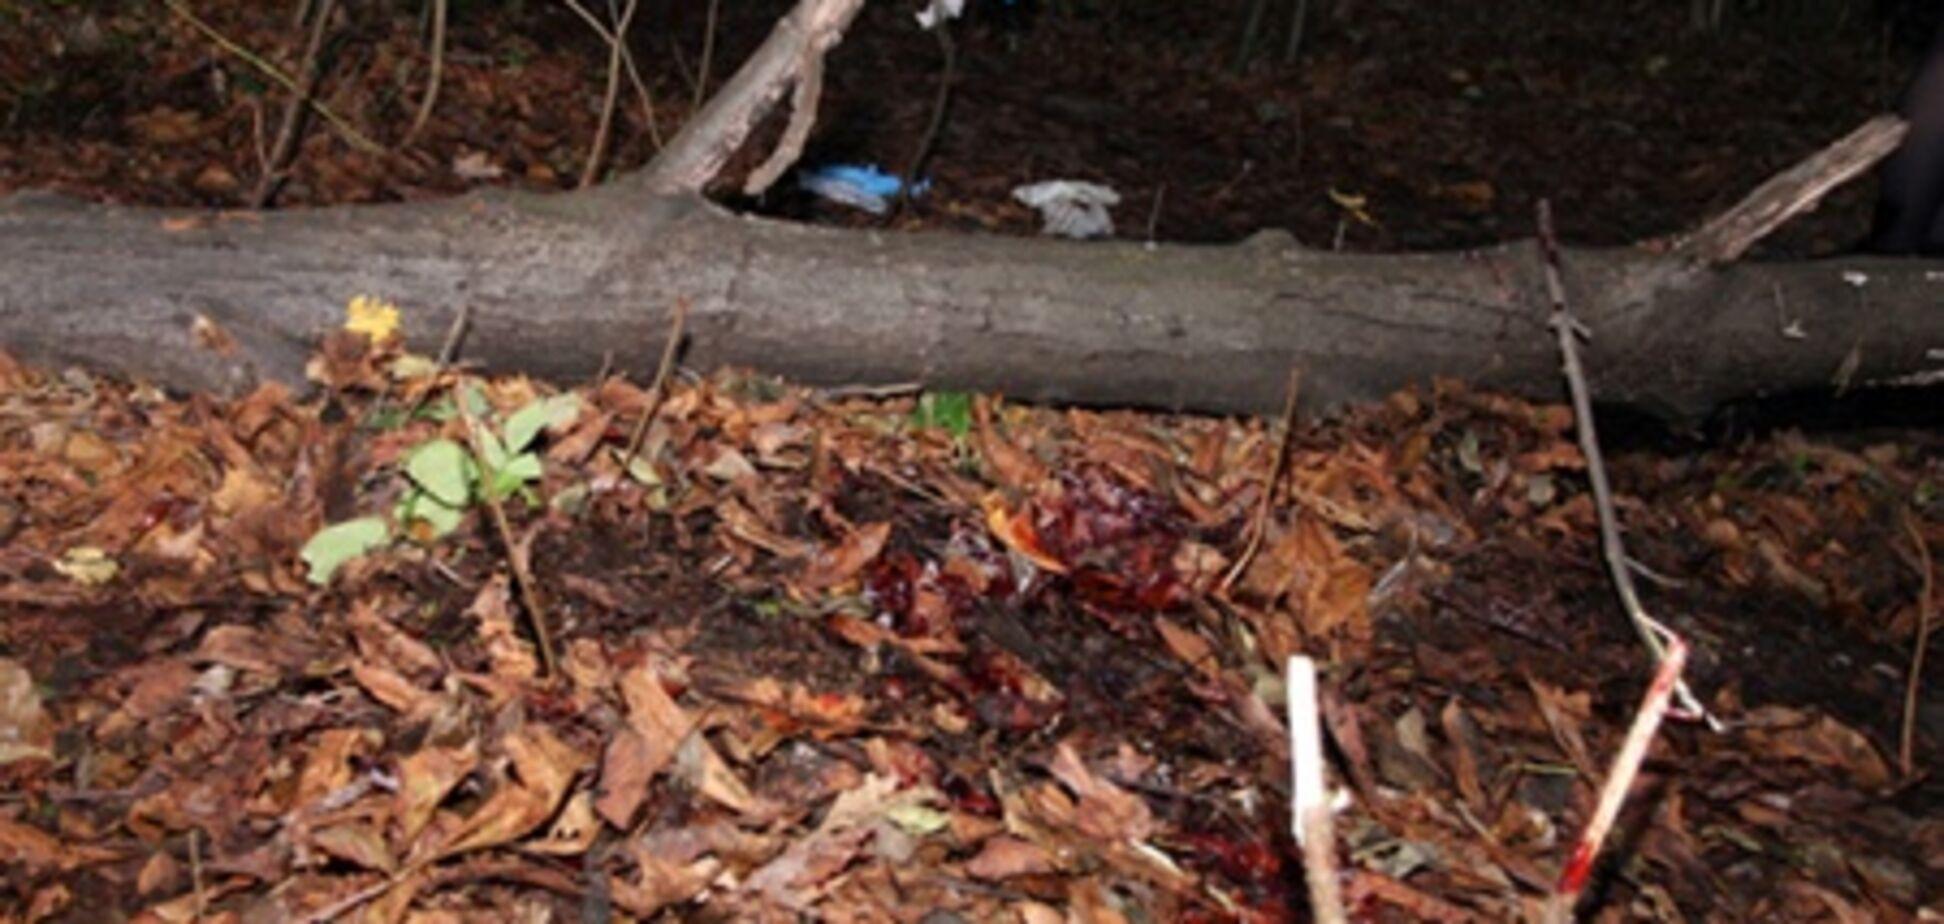 На месте убийства Мазурка много крови, милиция уехала